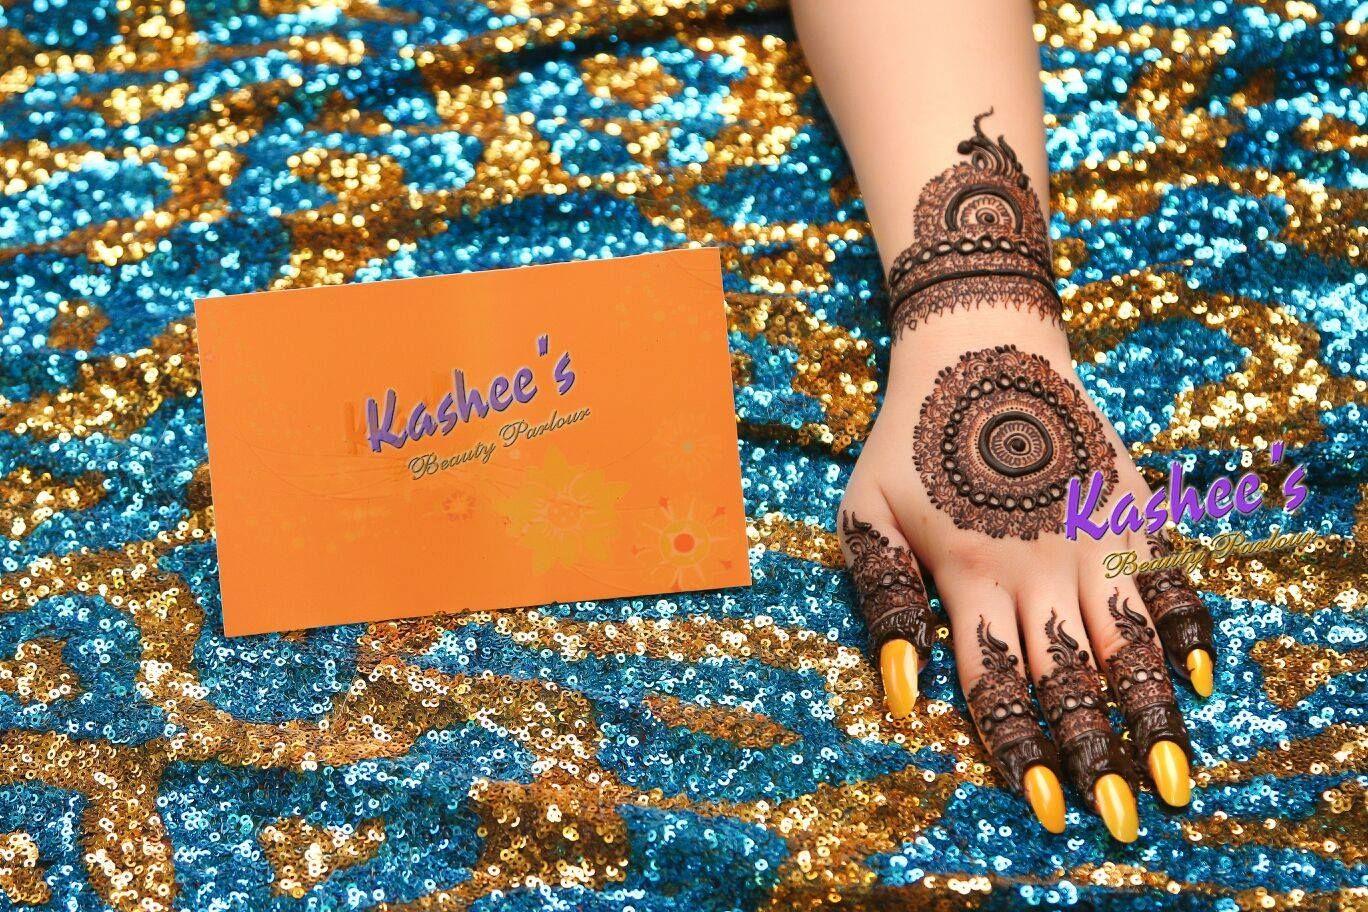 Design By Kashee S Beauty Parlour Henna Designs Mehndi Designs Kashees Mehndi